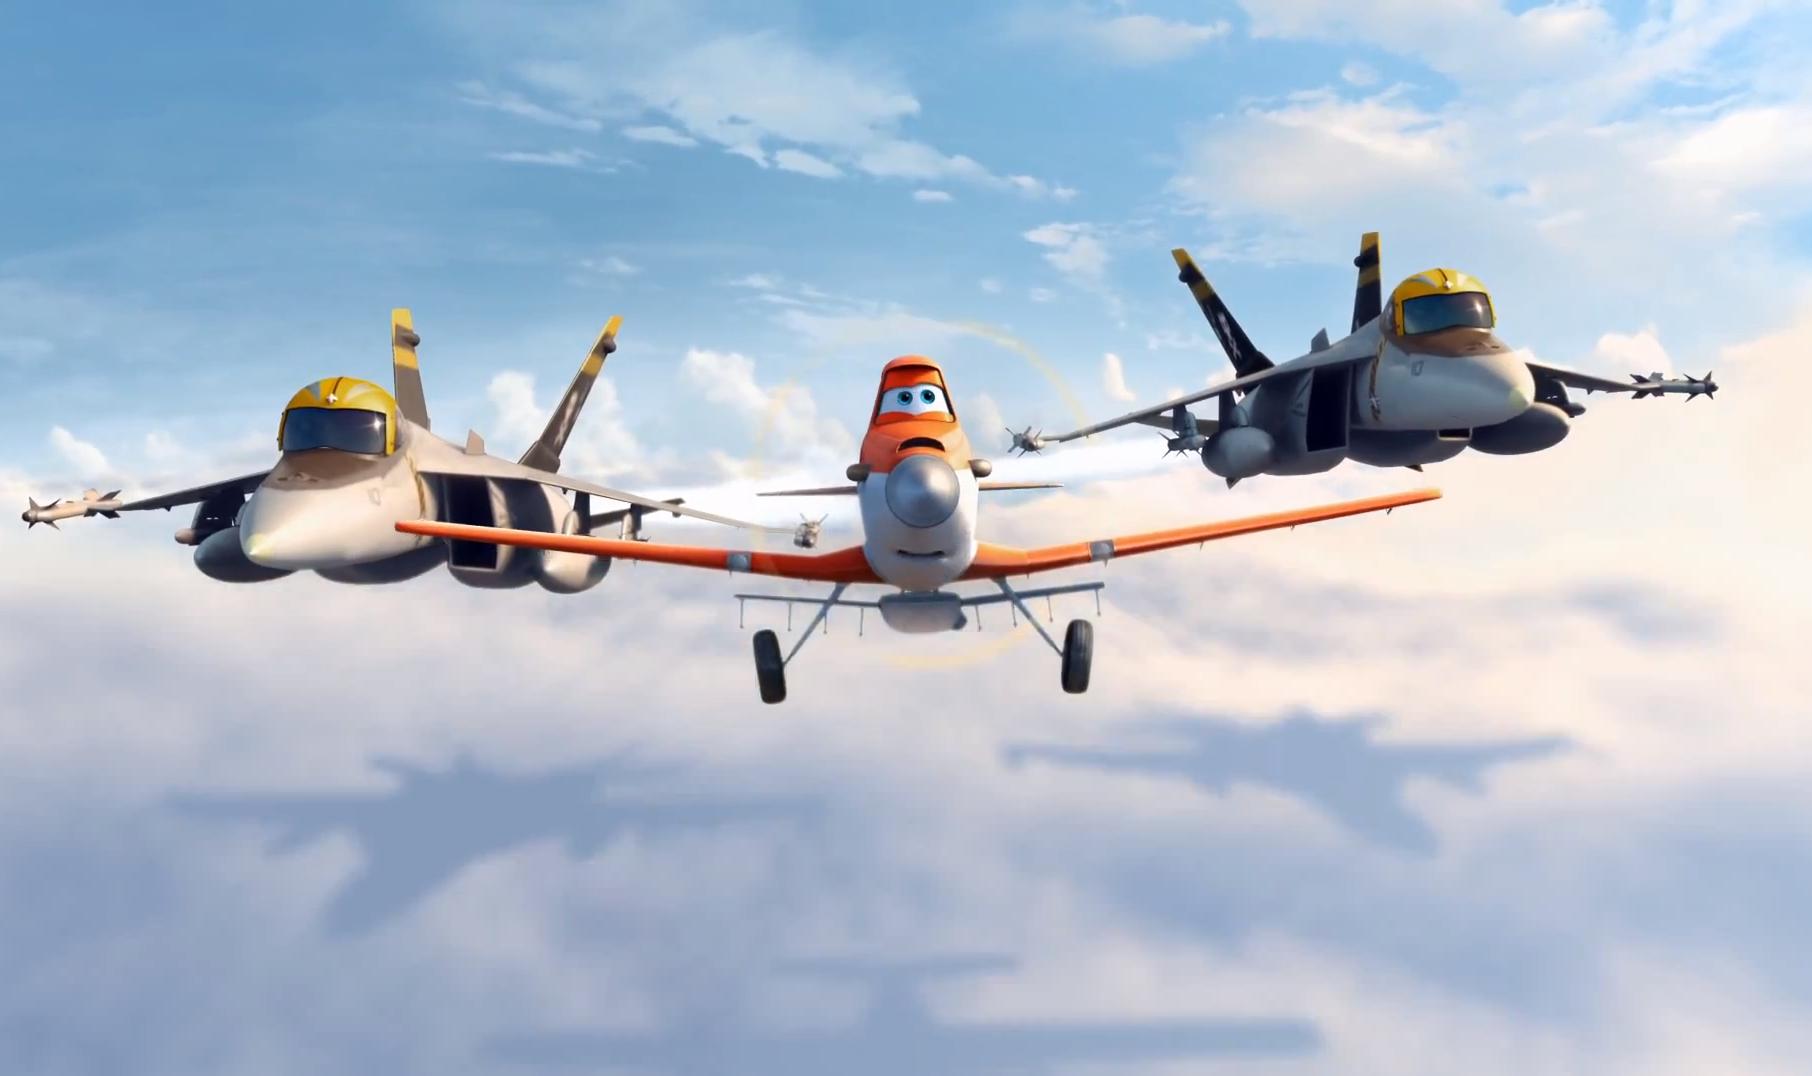 Disney's Planes - a great aviation movie - Movie Review